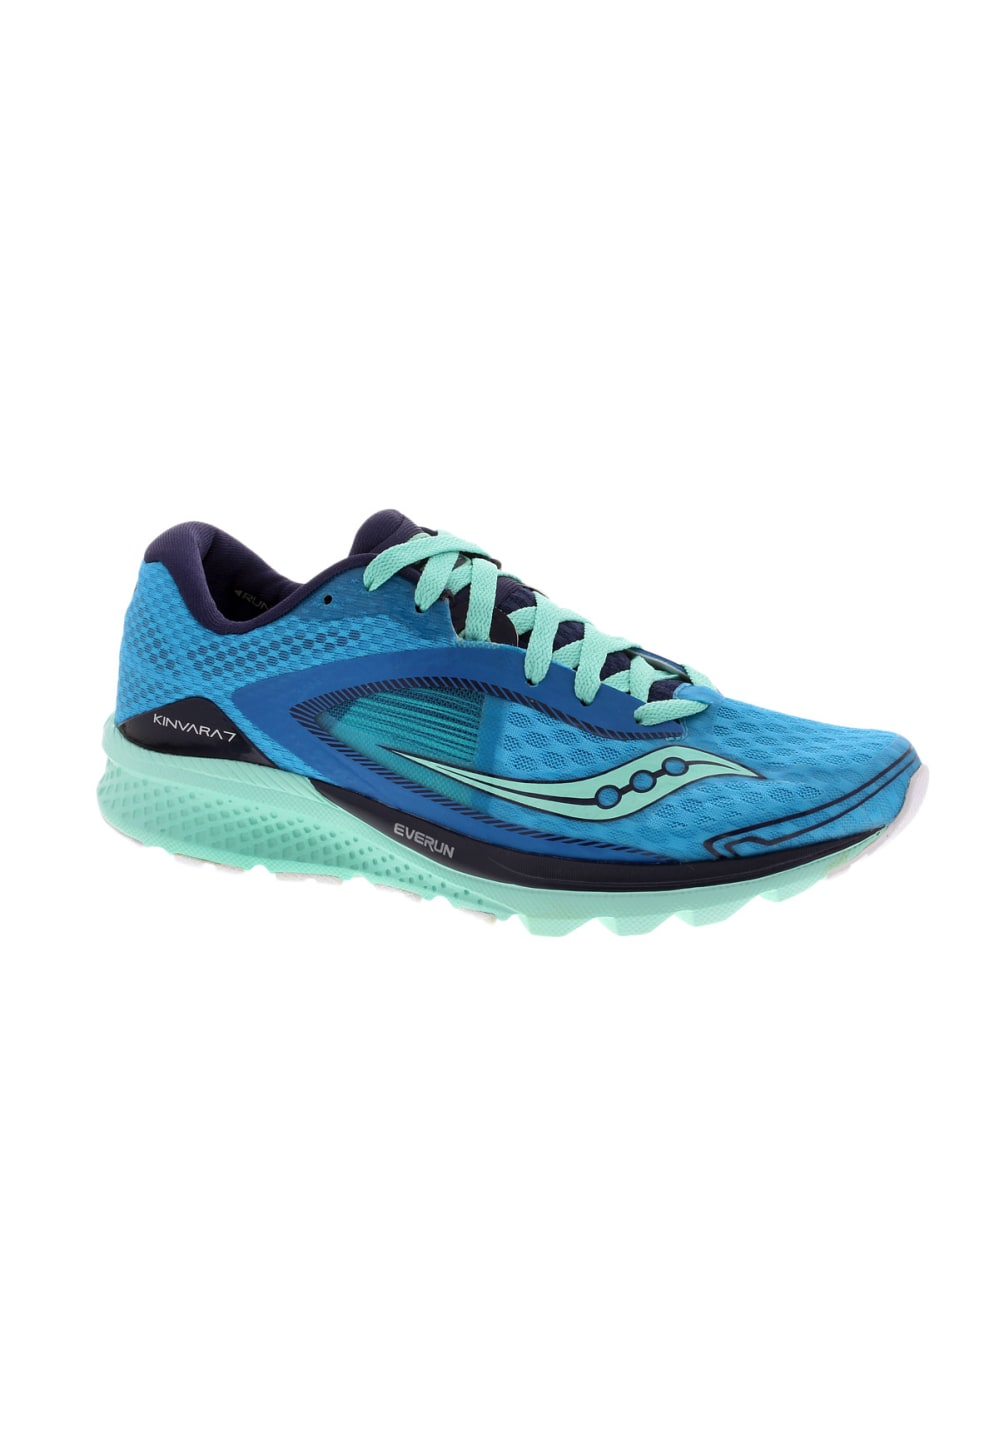 f1ef8df88c997 Saucony Kinvara 7 - Running shoes for Women - Blue